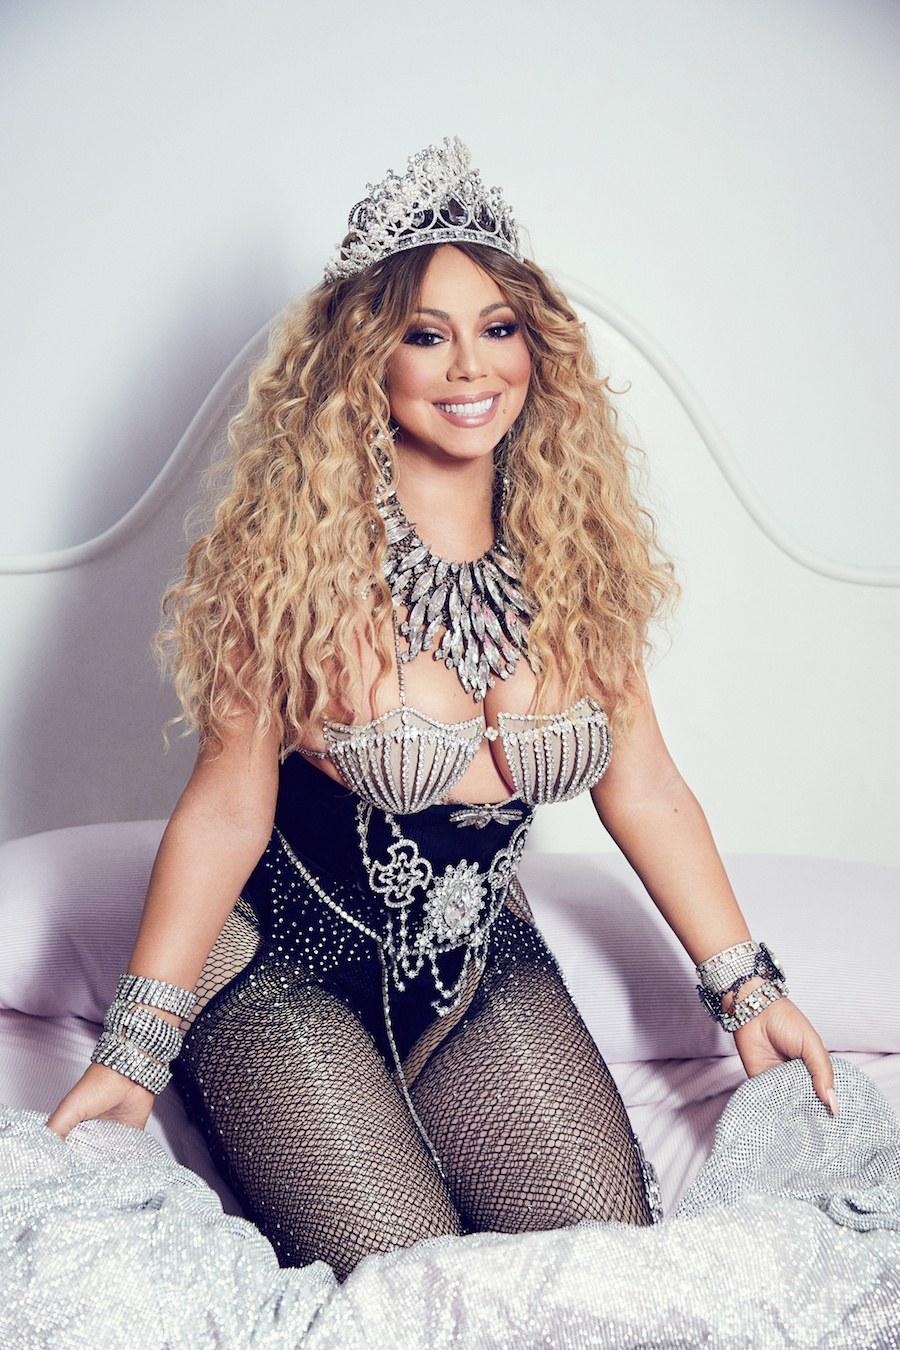 Fappening Fappening Mariah Carey naked photo 2017